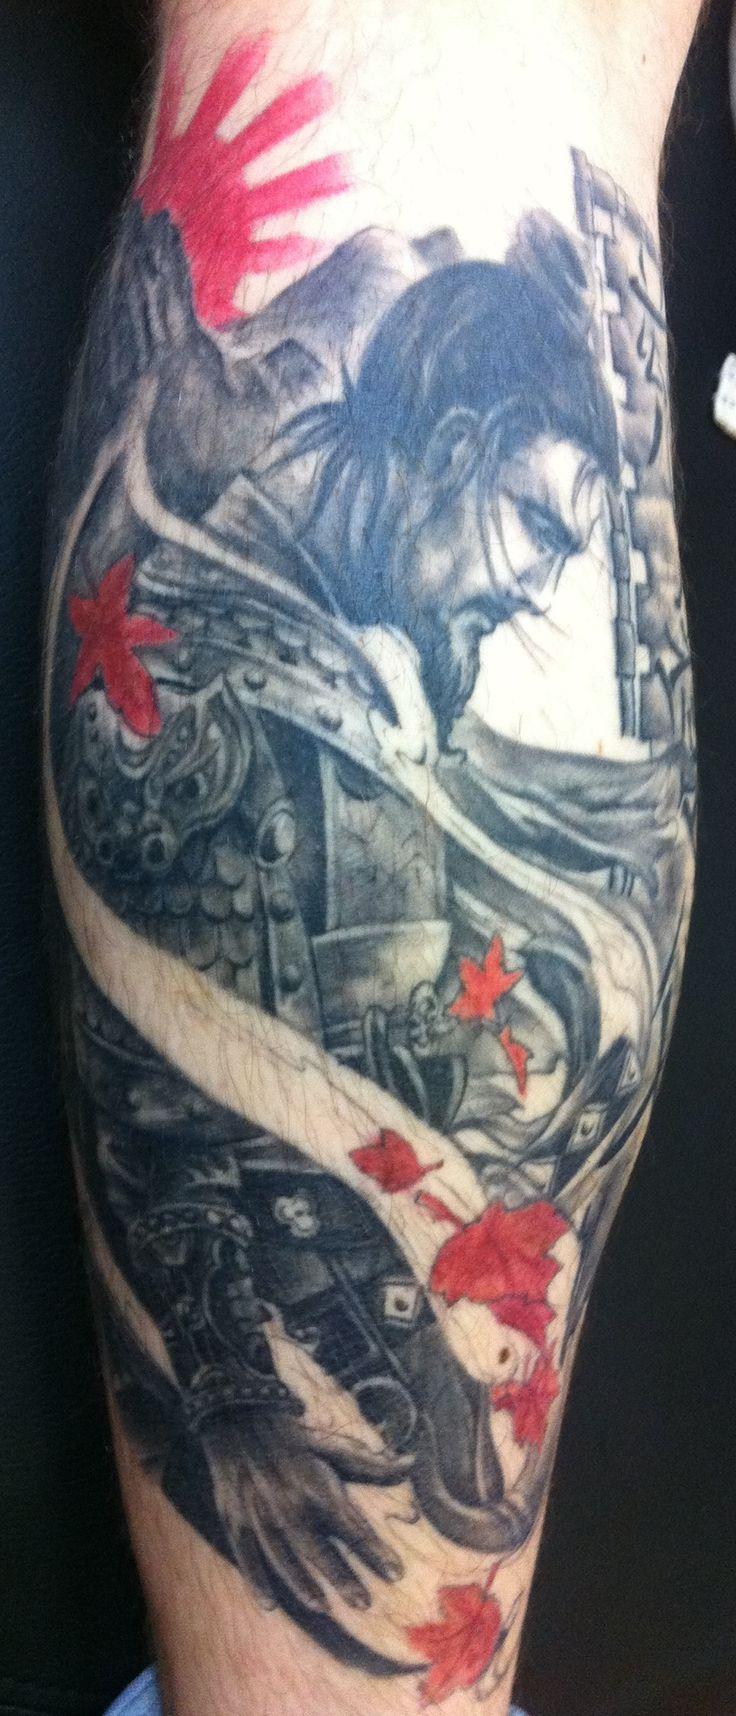 samurai tattoo tattoos pinterest samurai samurai. Black Bedroom Furniture Sets. Home Design Ideas